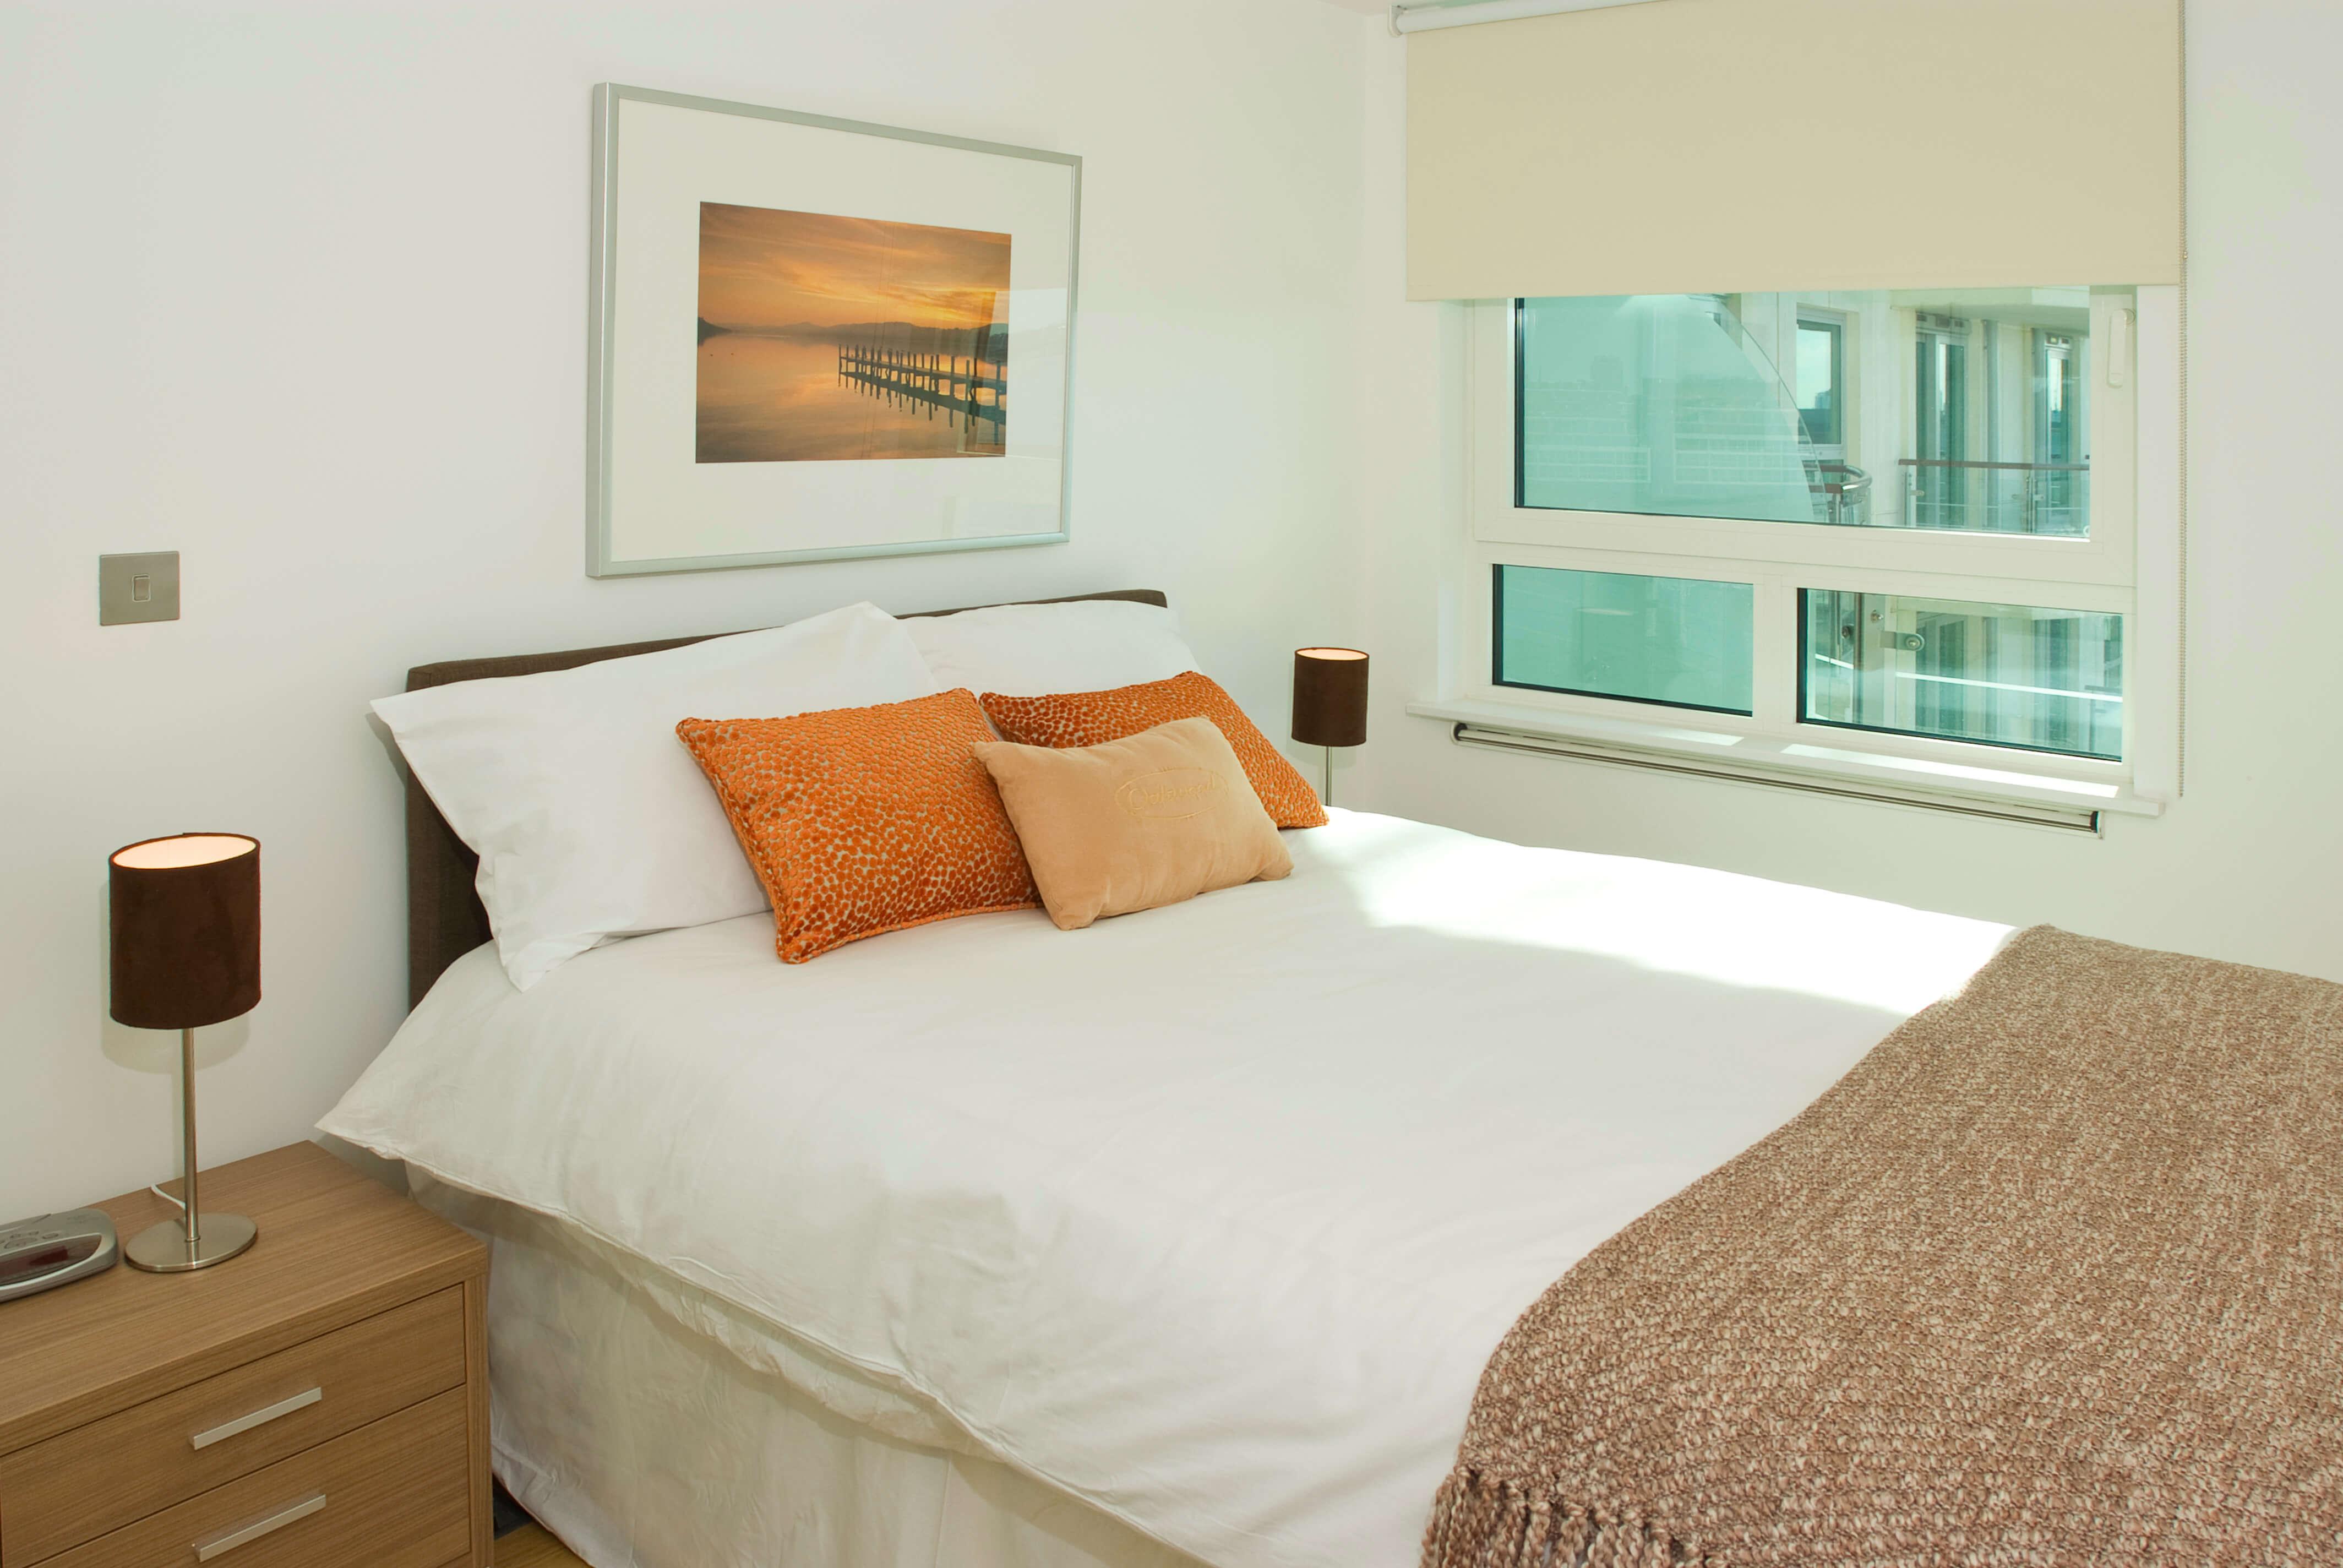 london apartememts bedroom